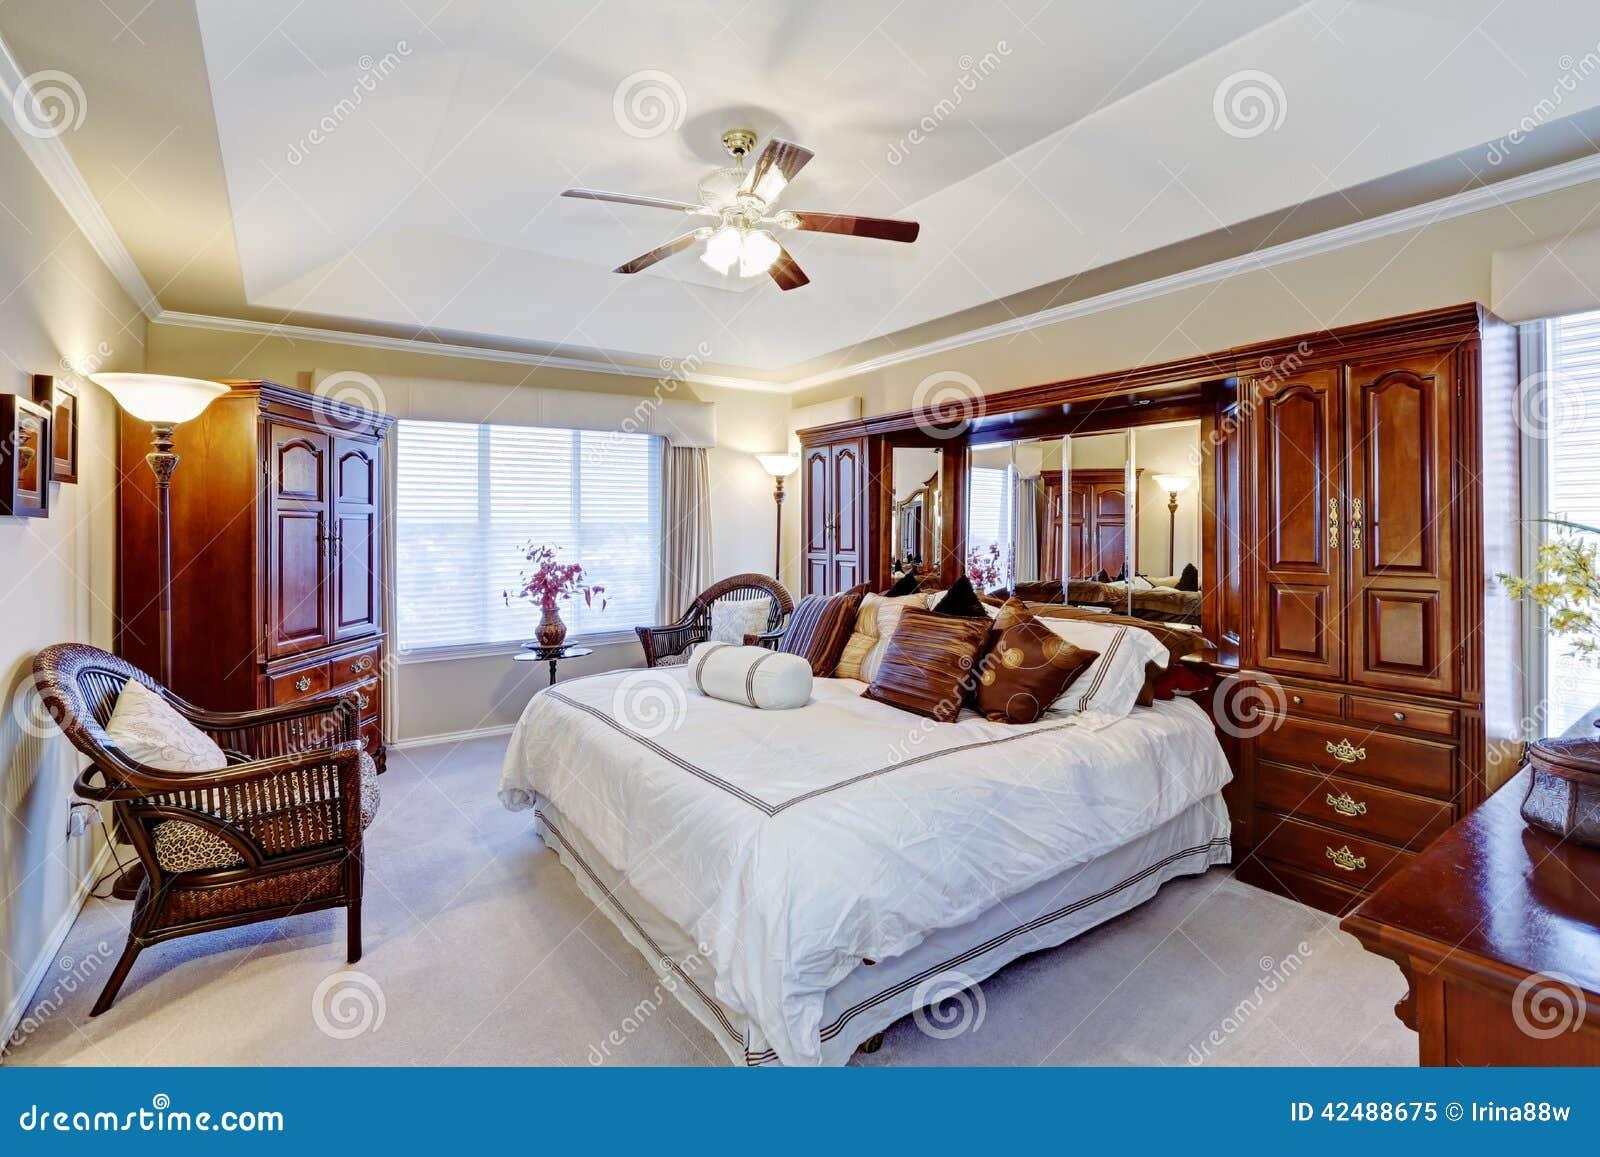 Luxury Master Bedroom Interior Stock Image Image Of American